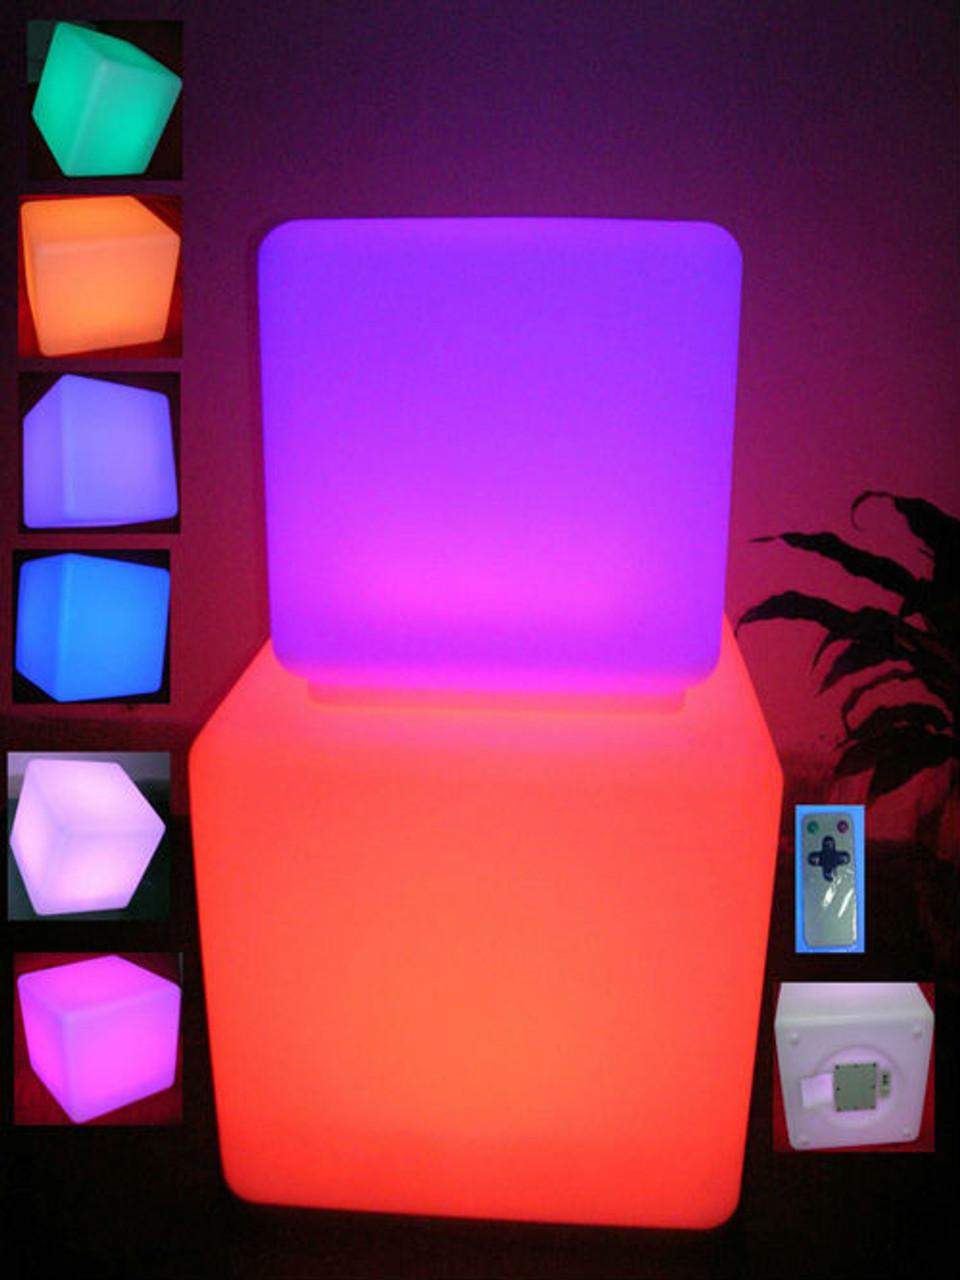 led cube, led furniture, led decoration, lighting furniture, nightclubs